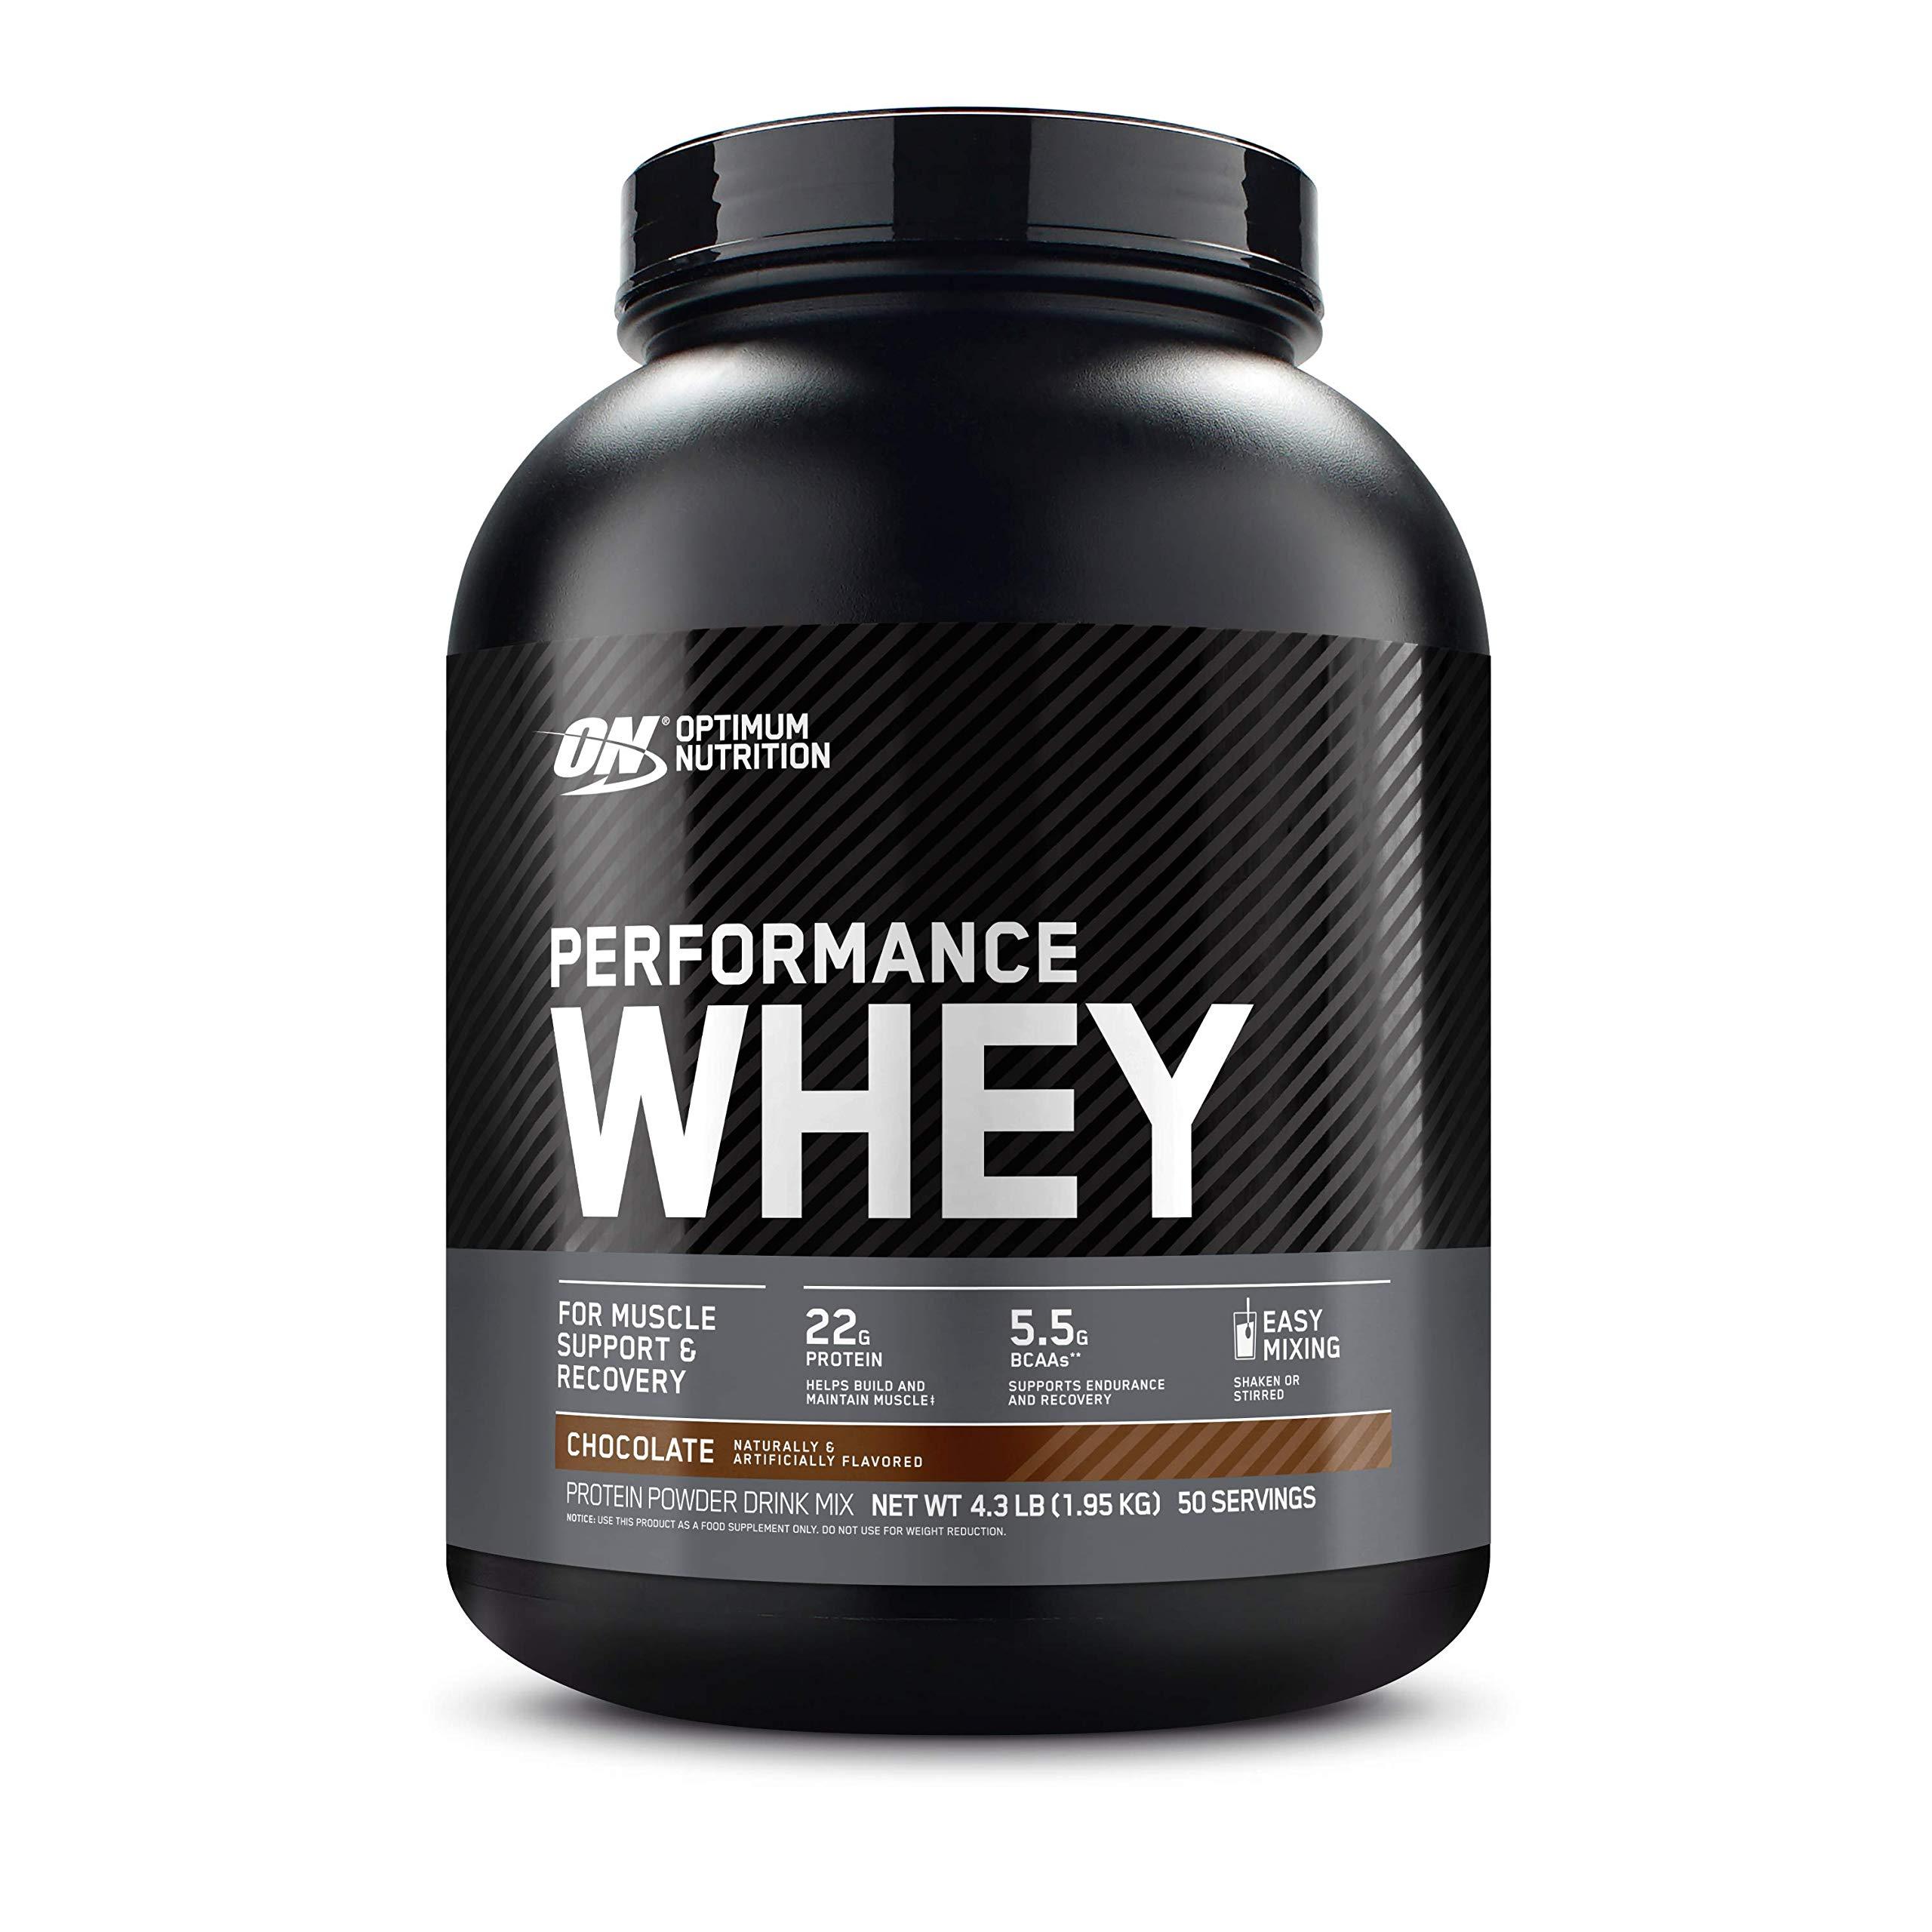 Optimum Nutrition Performance Whey Protein Powder, Whey Protein  Concentrate, Whey Protein Isolate, Hydrolyzed Whey Protein Isolate, Flavor:  Chocolate Shake, 50 Servings- Buy Online in Pakistan at desertcart.pk.  ProductId : 810903.